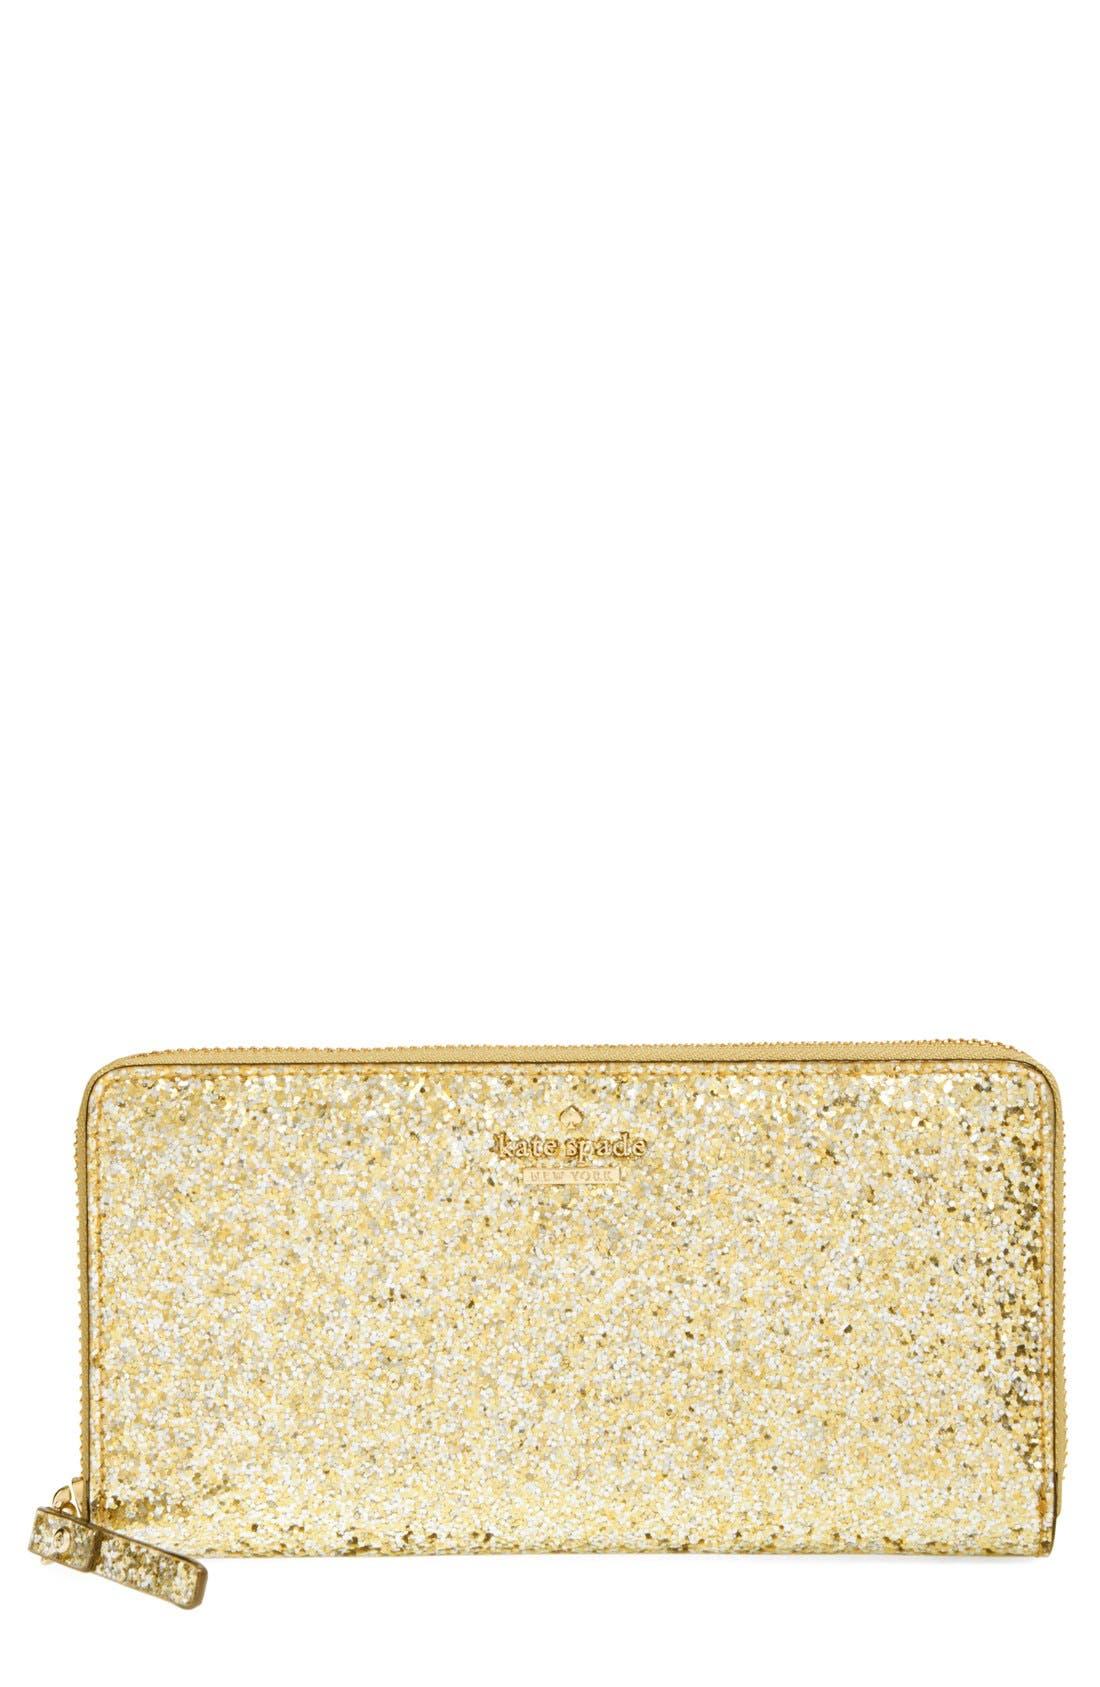 Main Image - kate spade new york 'glitter bug - lacey' zip around wallet